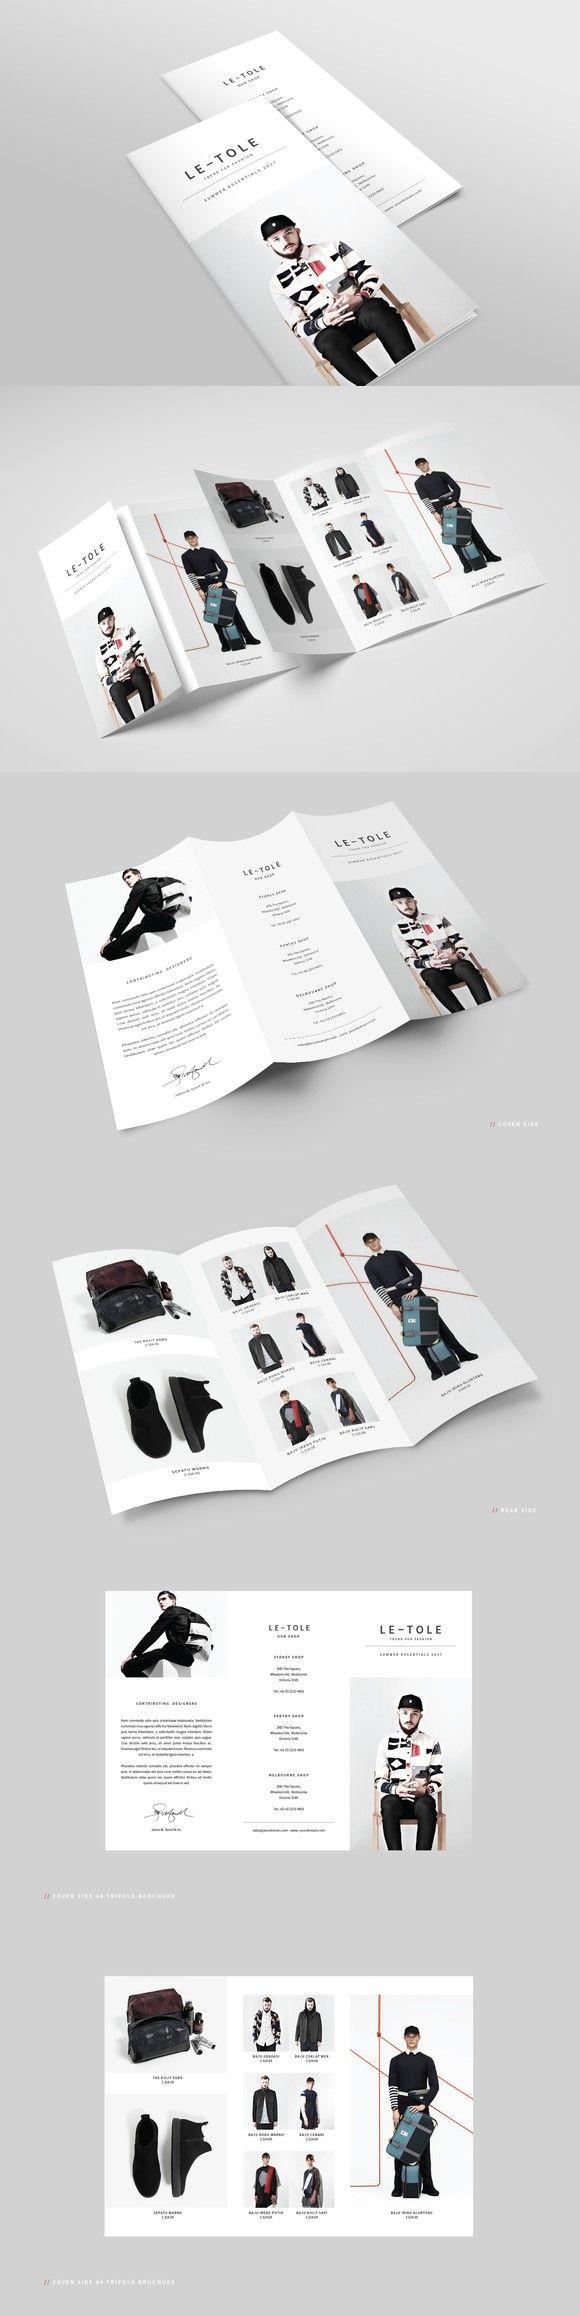 Fashion A4 Trifold Brochure